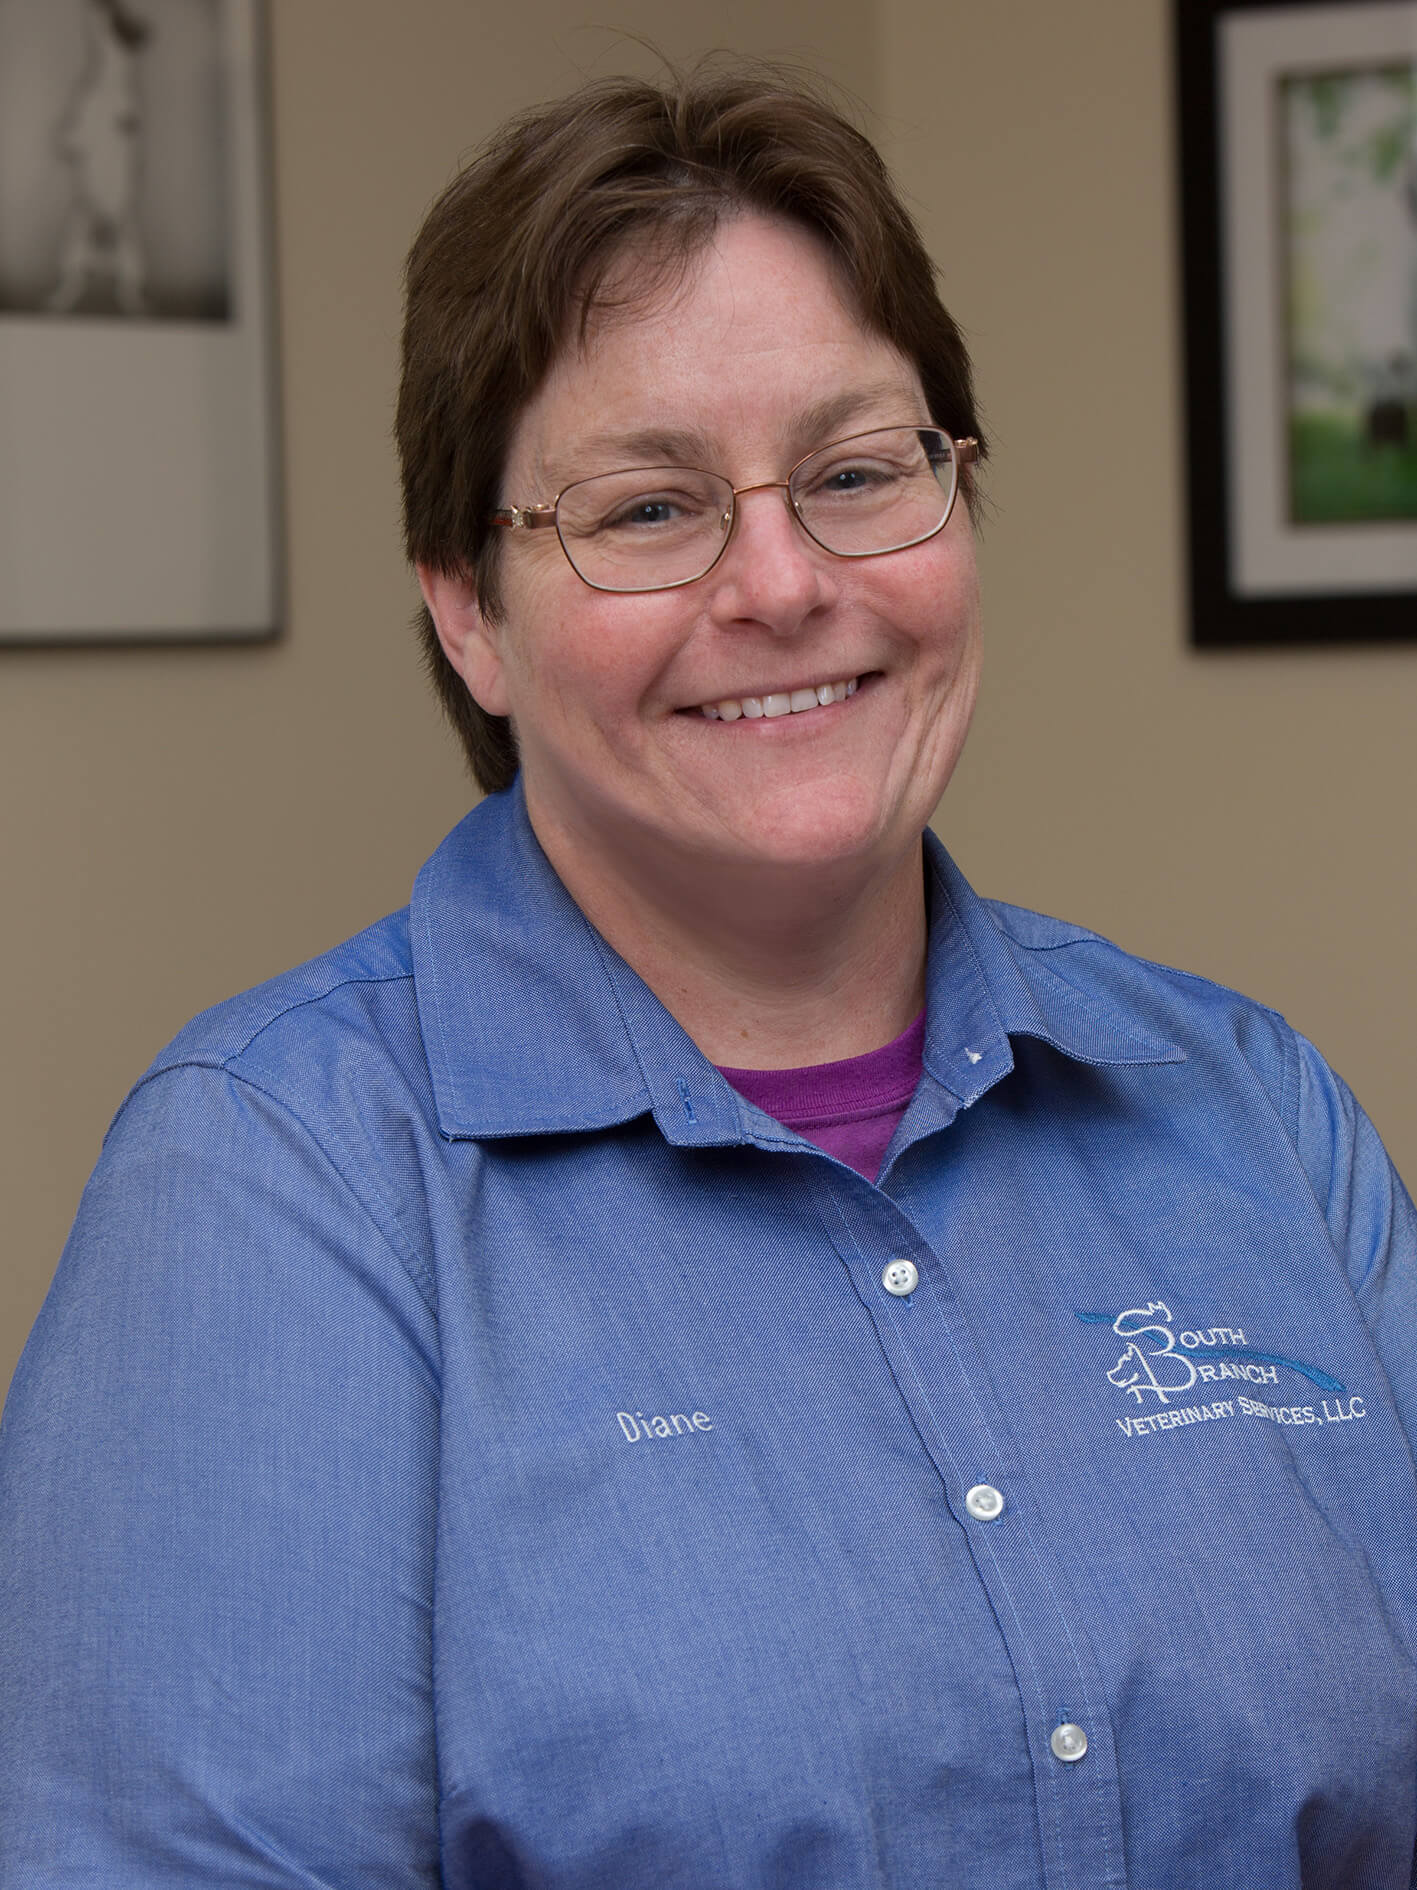 Diane Fitzpatrick